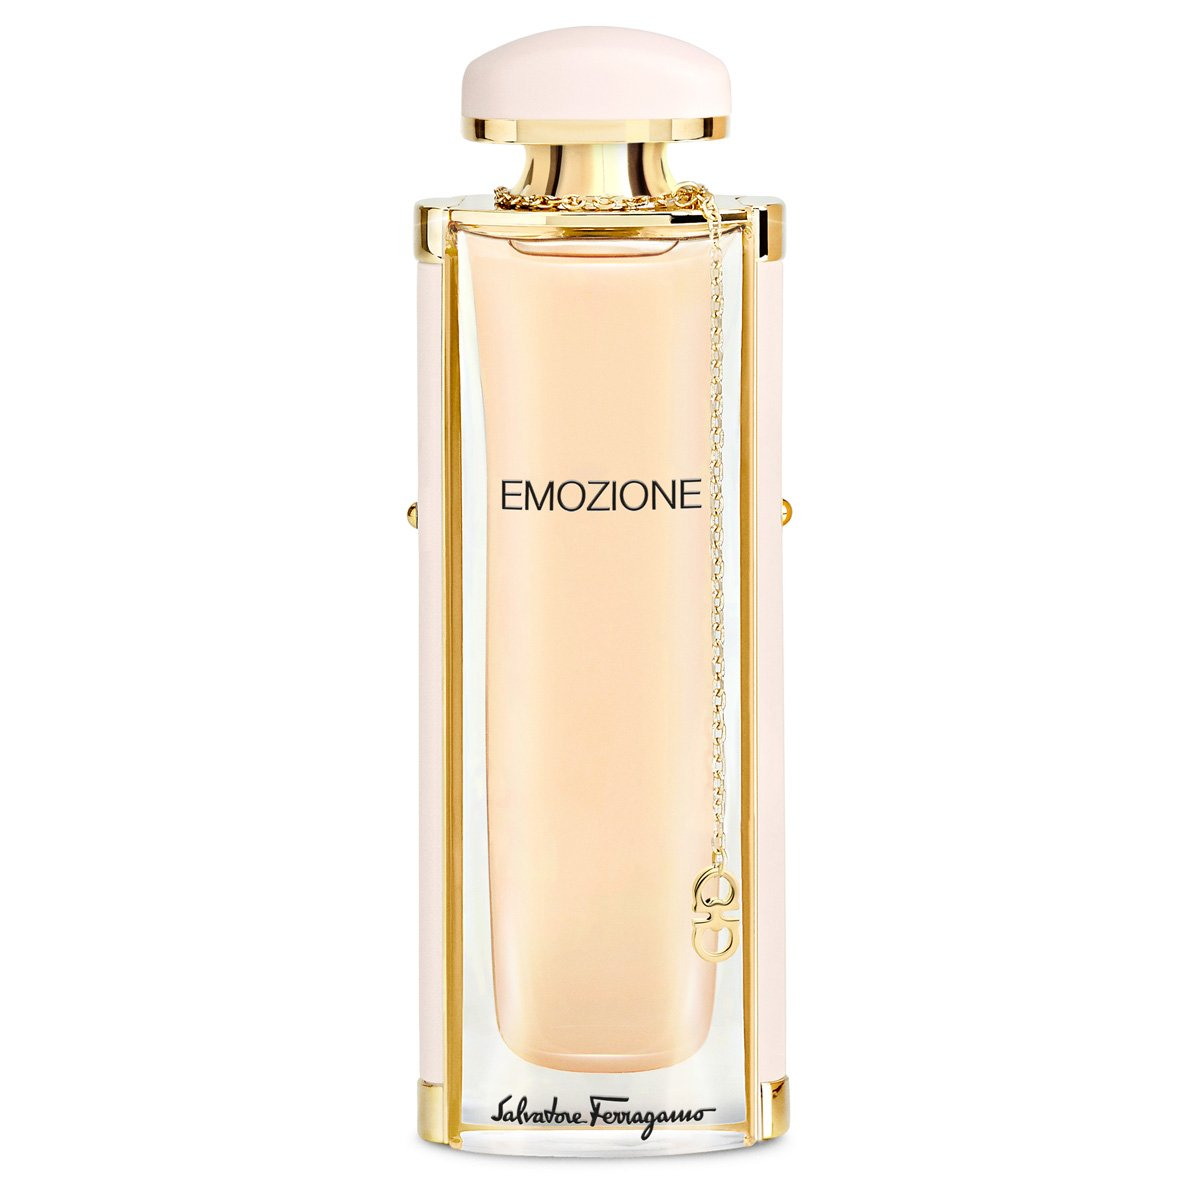 Perfume Emozione Feminino Salvatore Ferragamo EDP 50ml